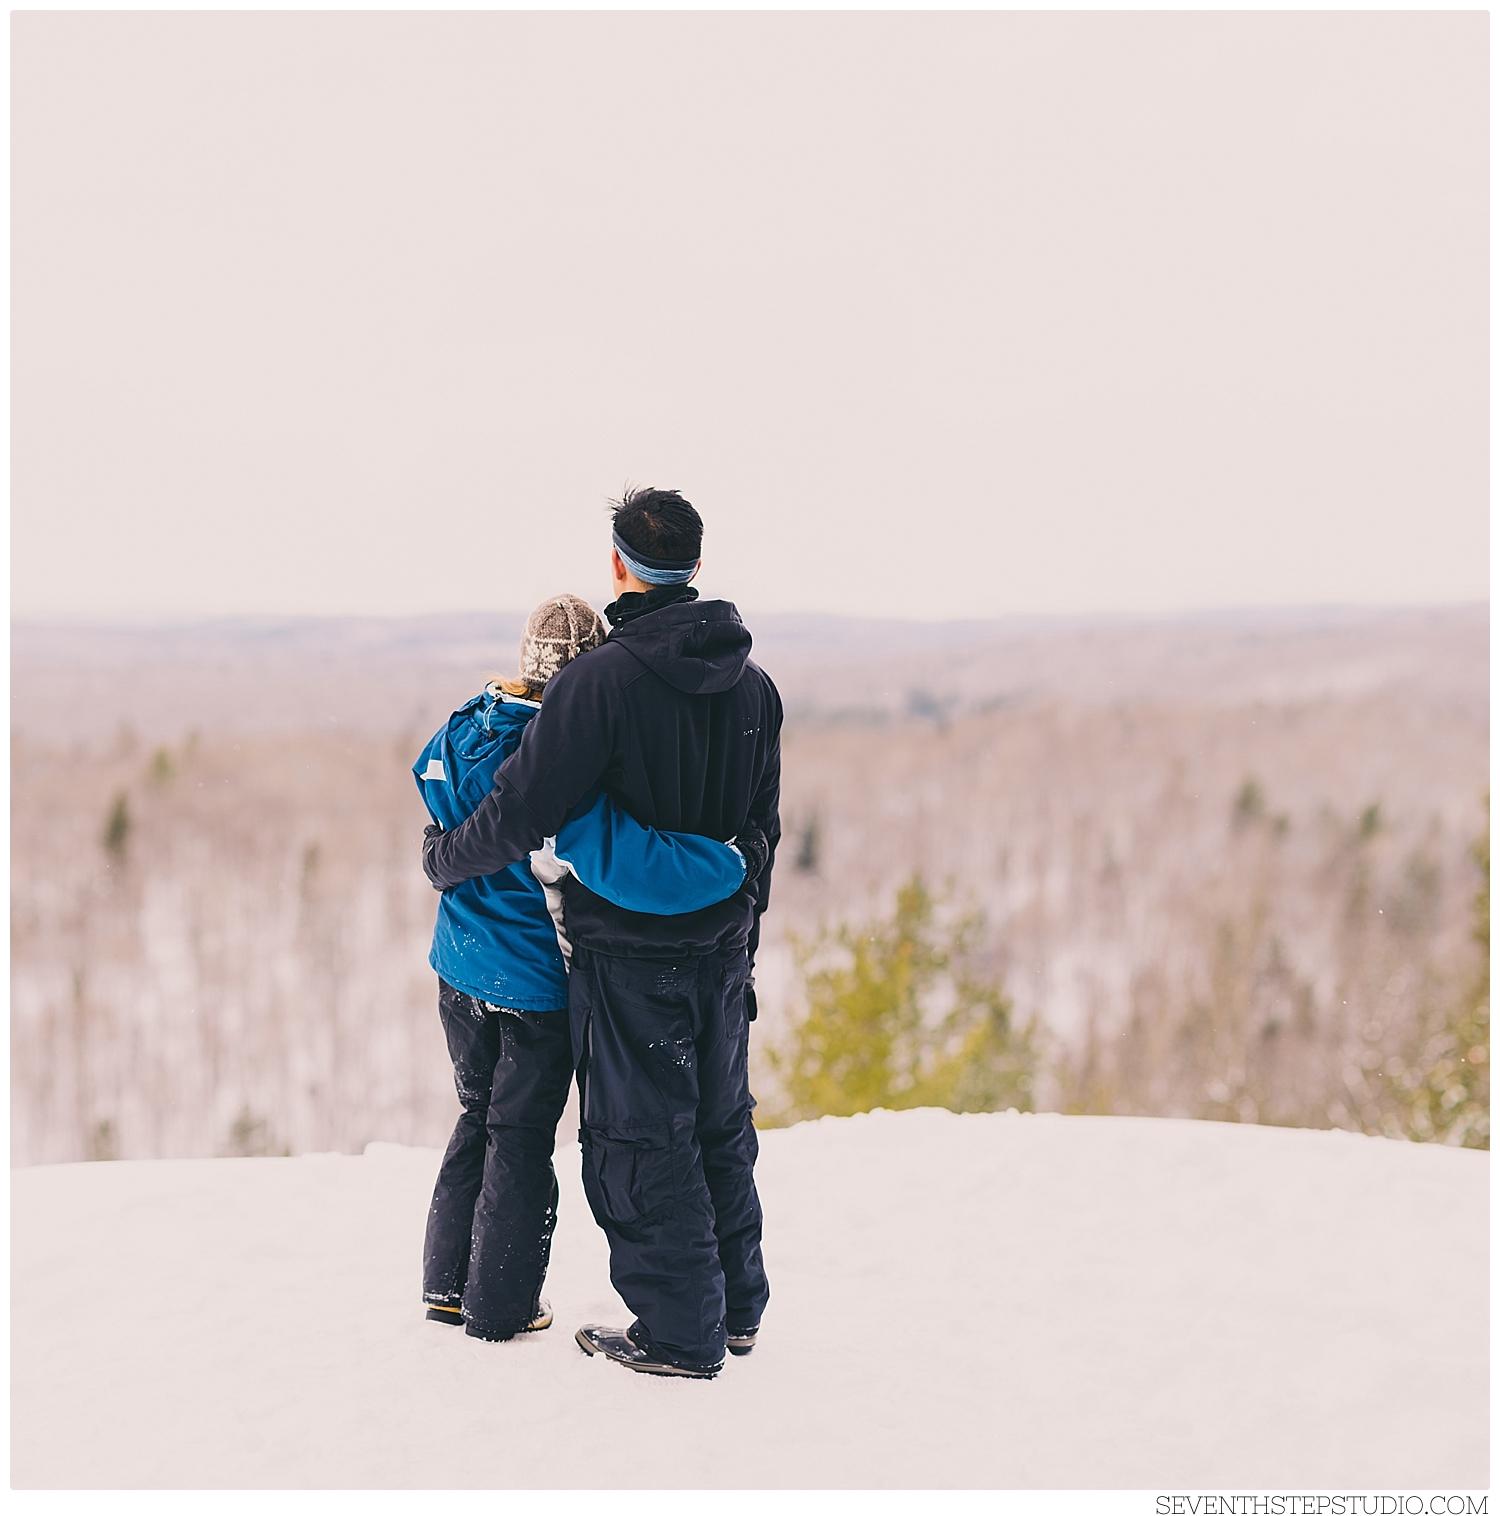 Seventh_Step_Studio_Algonquin_Winter_Camping-257.jpg